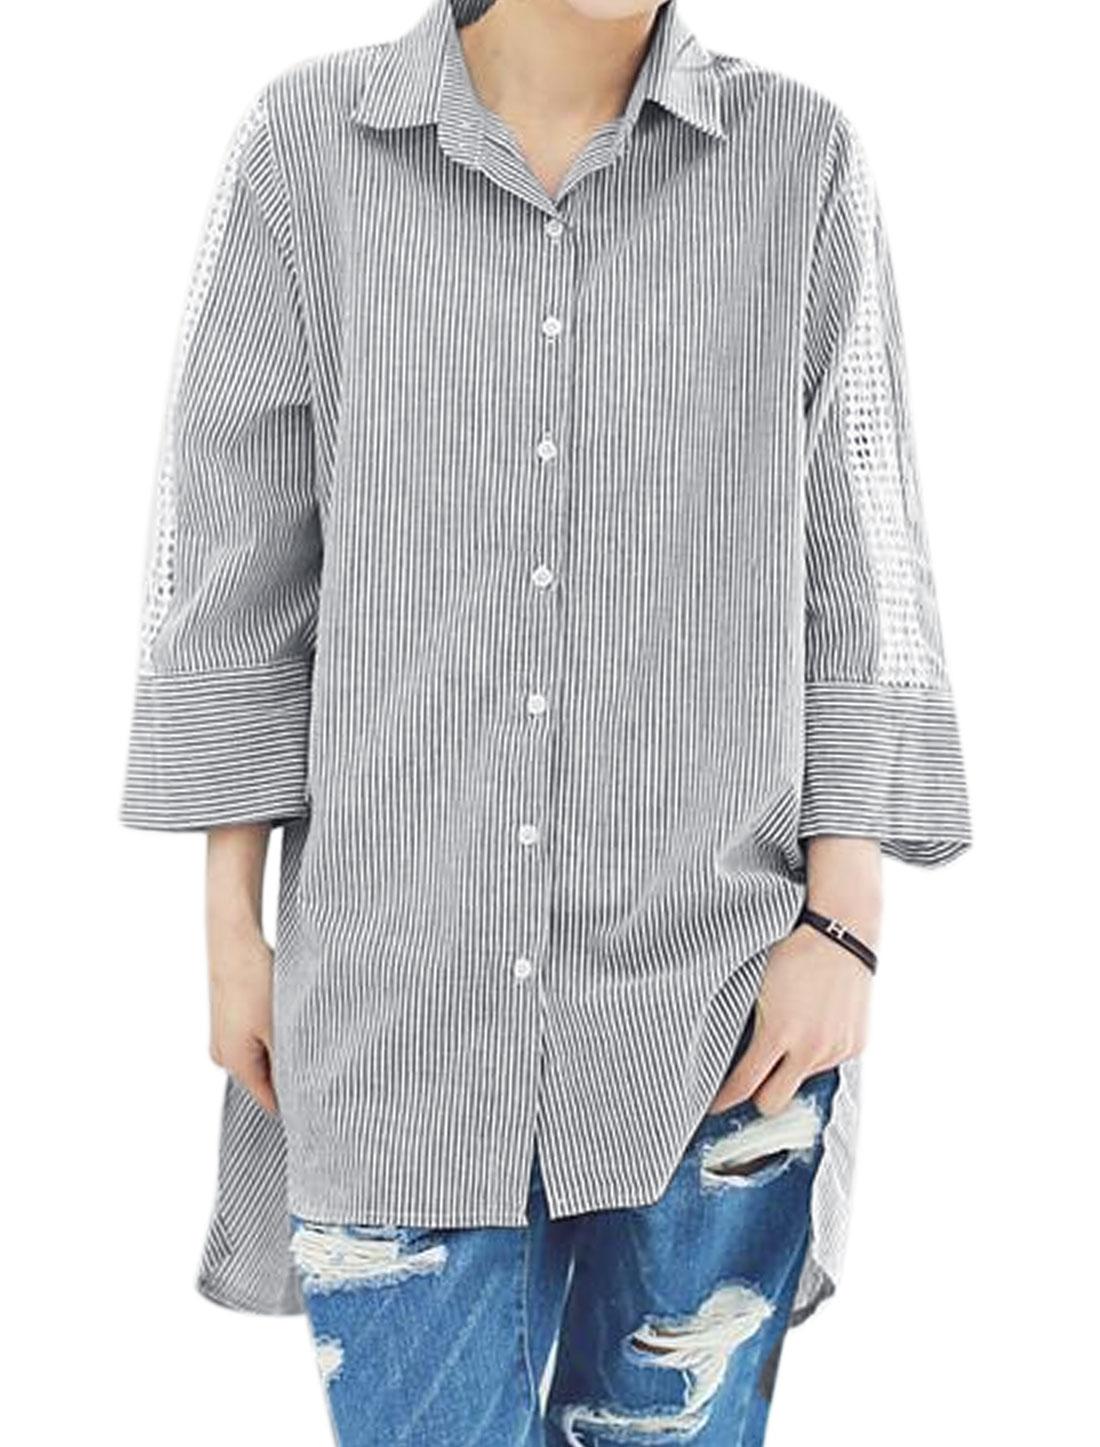 Women 3/4 Sleeves Stripes Crochet Panel High Low Hem Tunic Shirt Black S